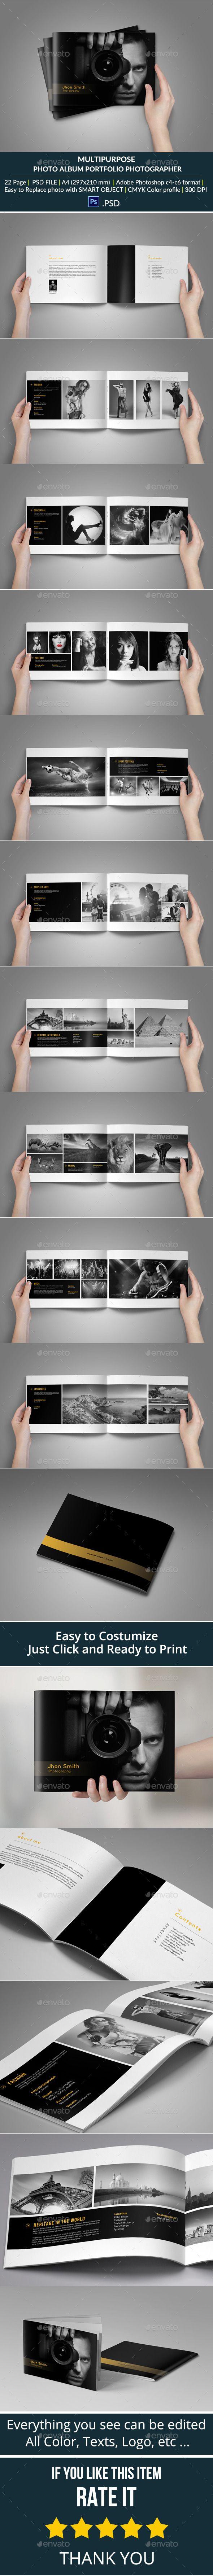 Portfolio Photographer Album Template #design Download: http://graphicriver.net/item/portfolio-photographer/9448257?ref=ksioks